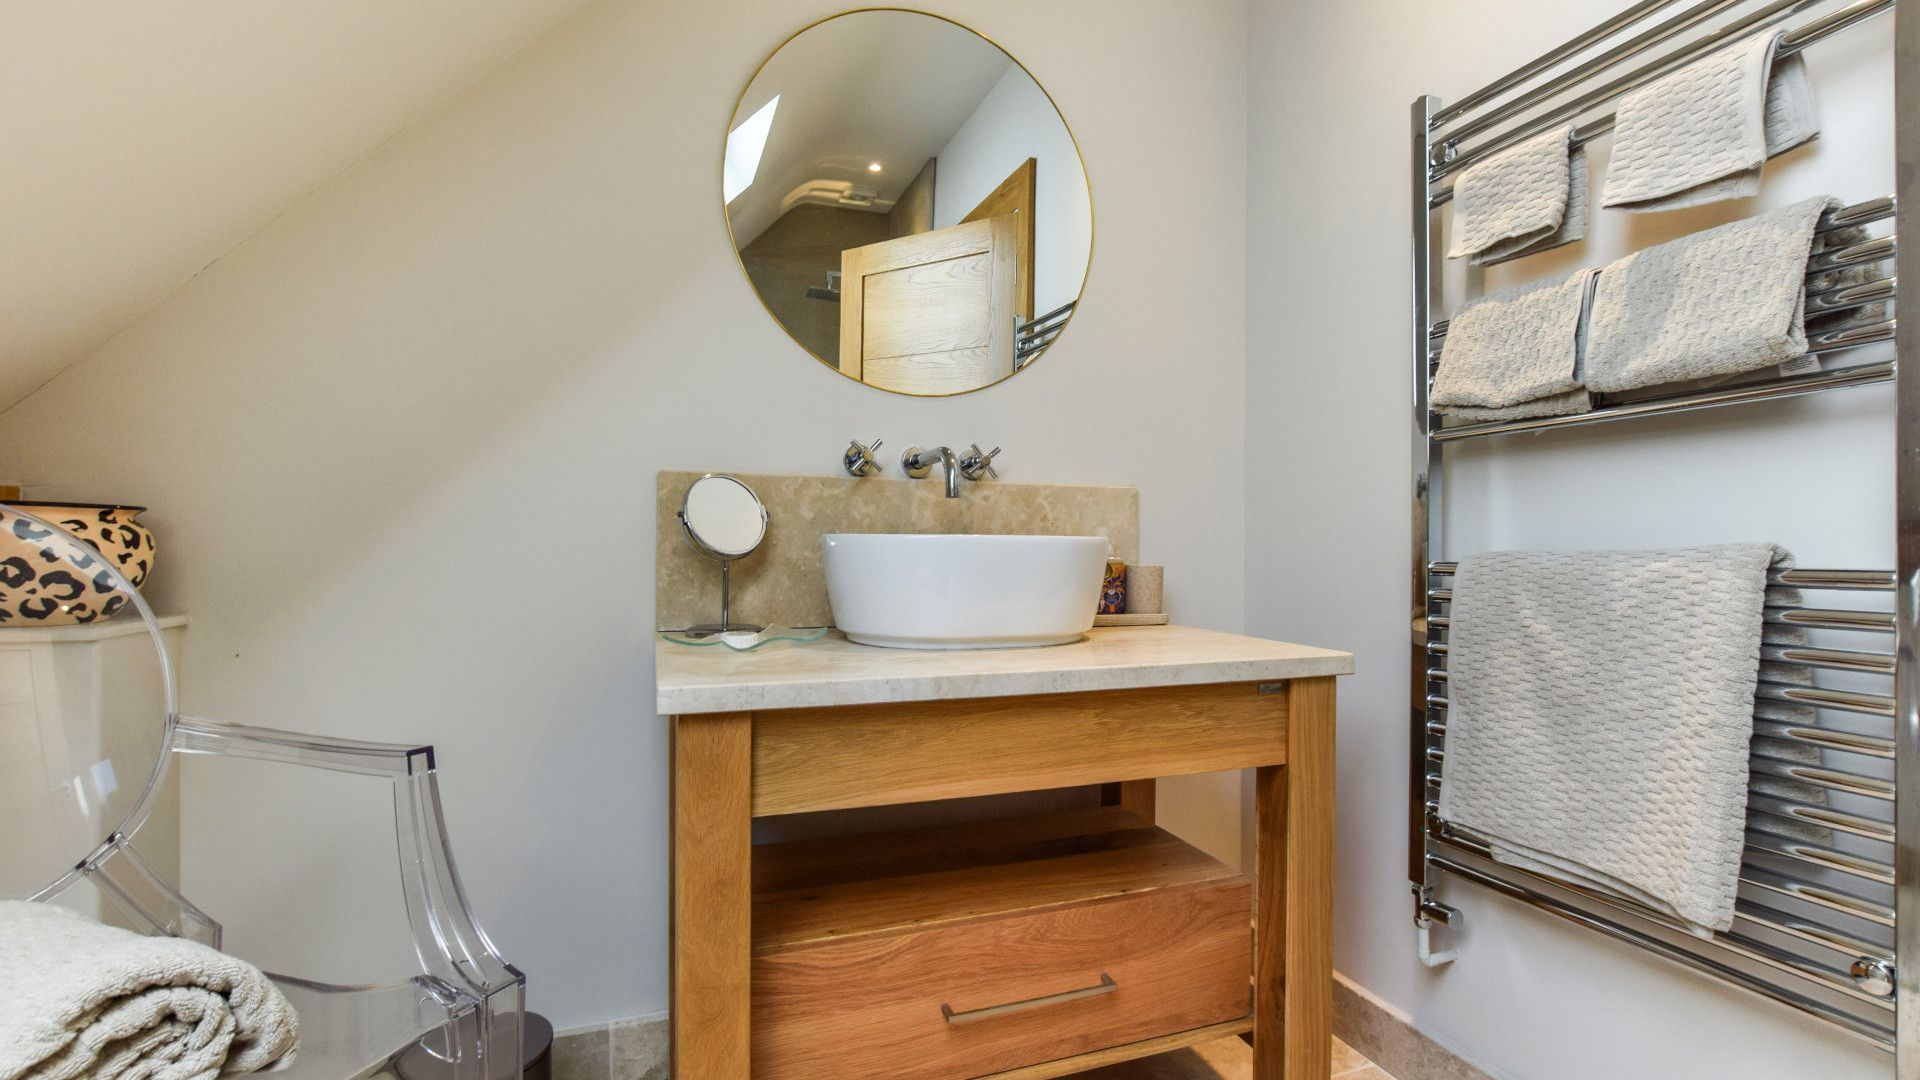 Shower room, Sycamore, Bolthole Retreats